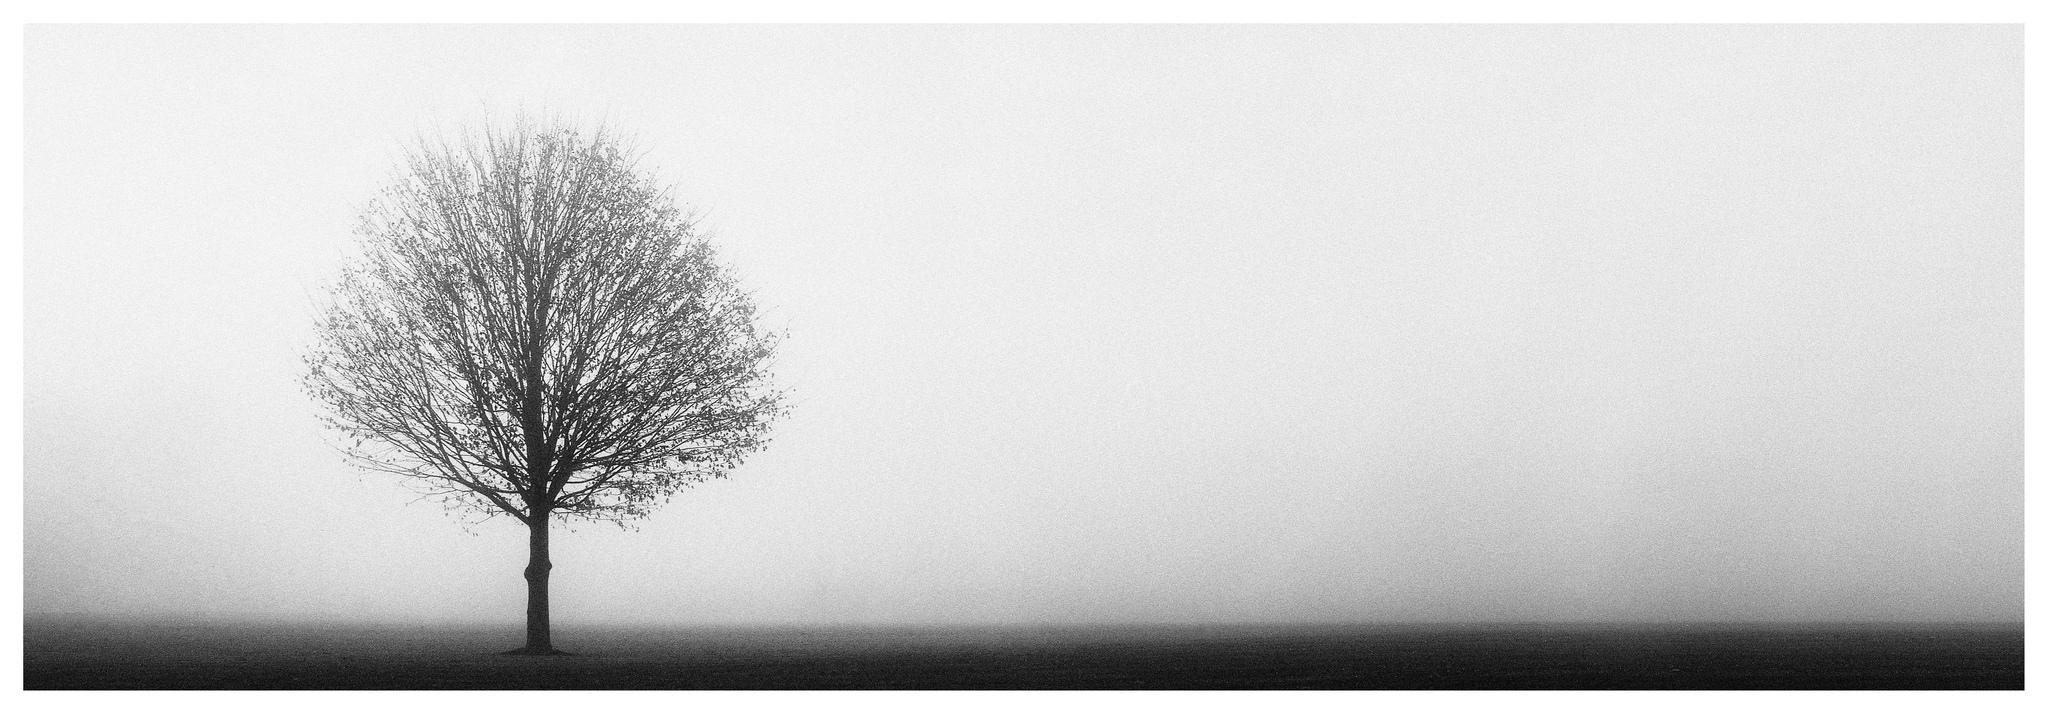 Tree in the Fog. Fuji GX617 on HP5+ film.